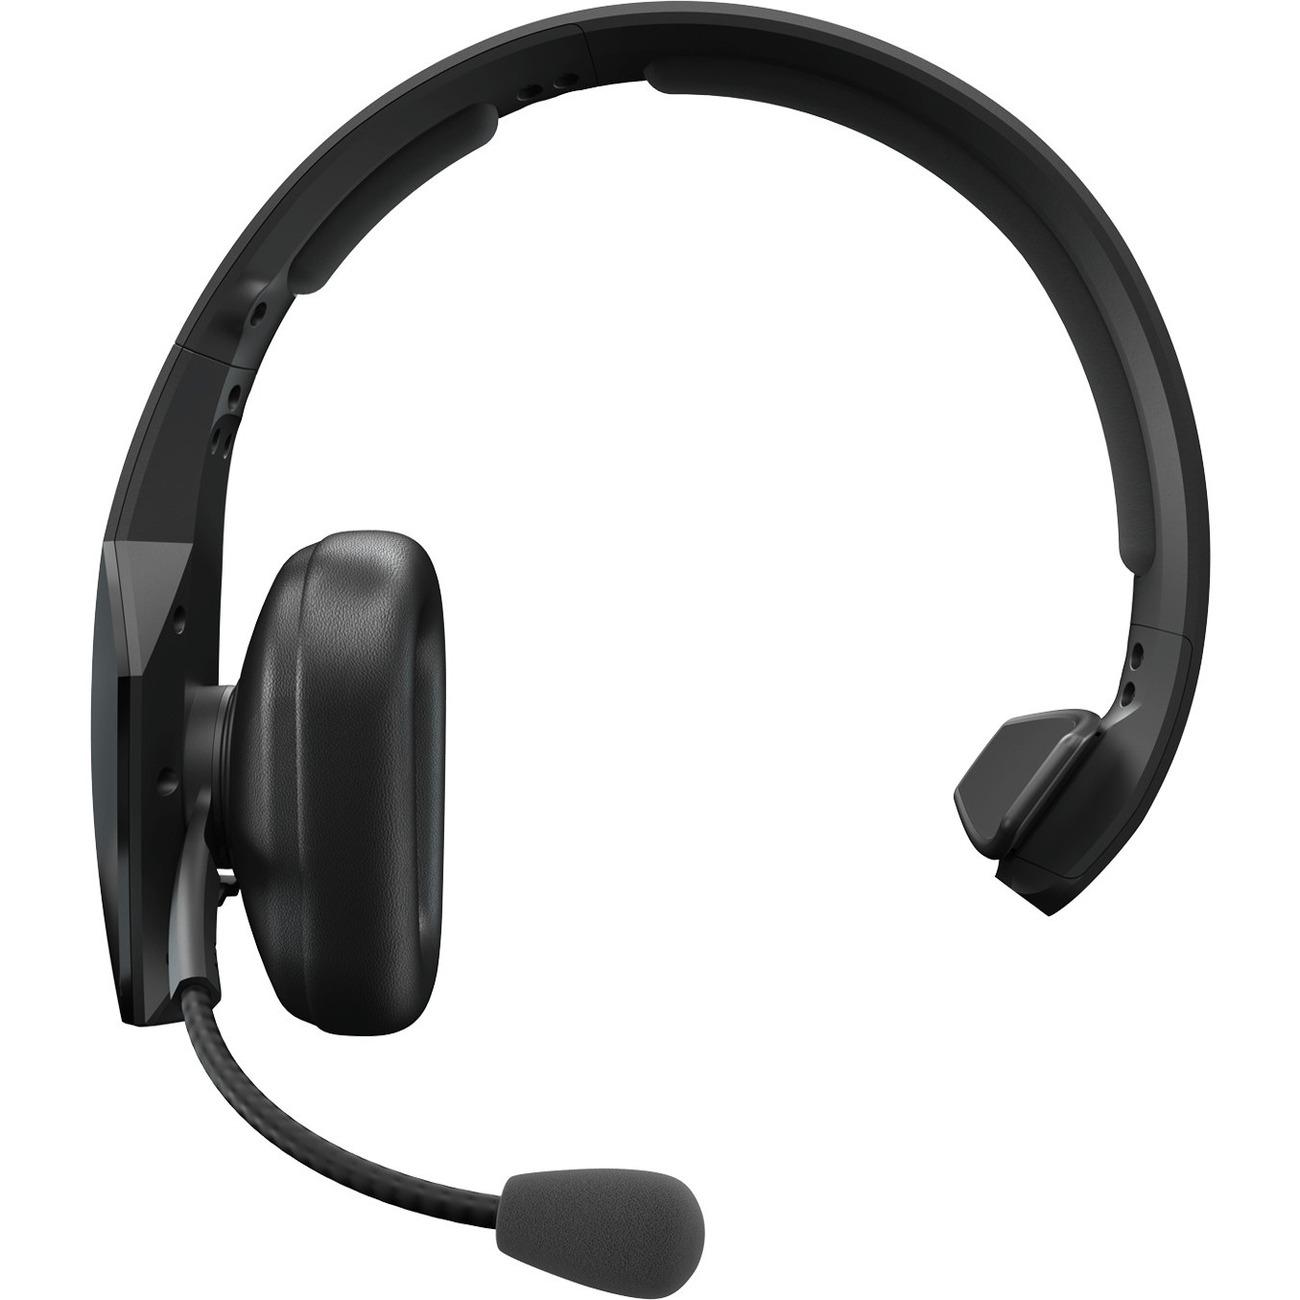 BlueParrott B550-XT Headset_subImage_1